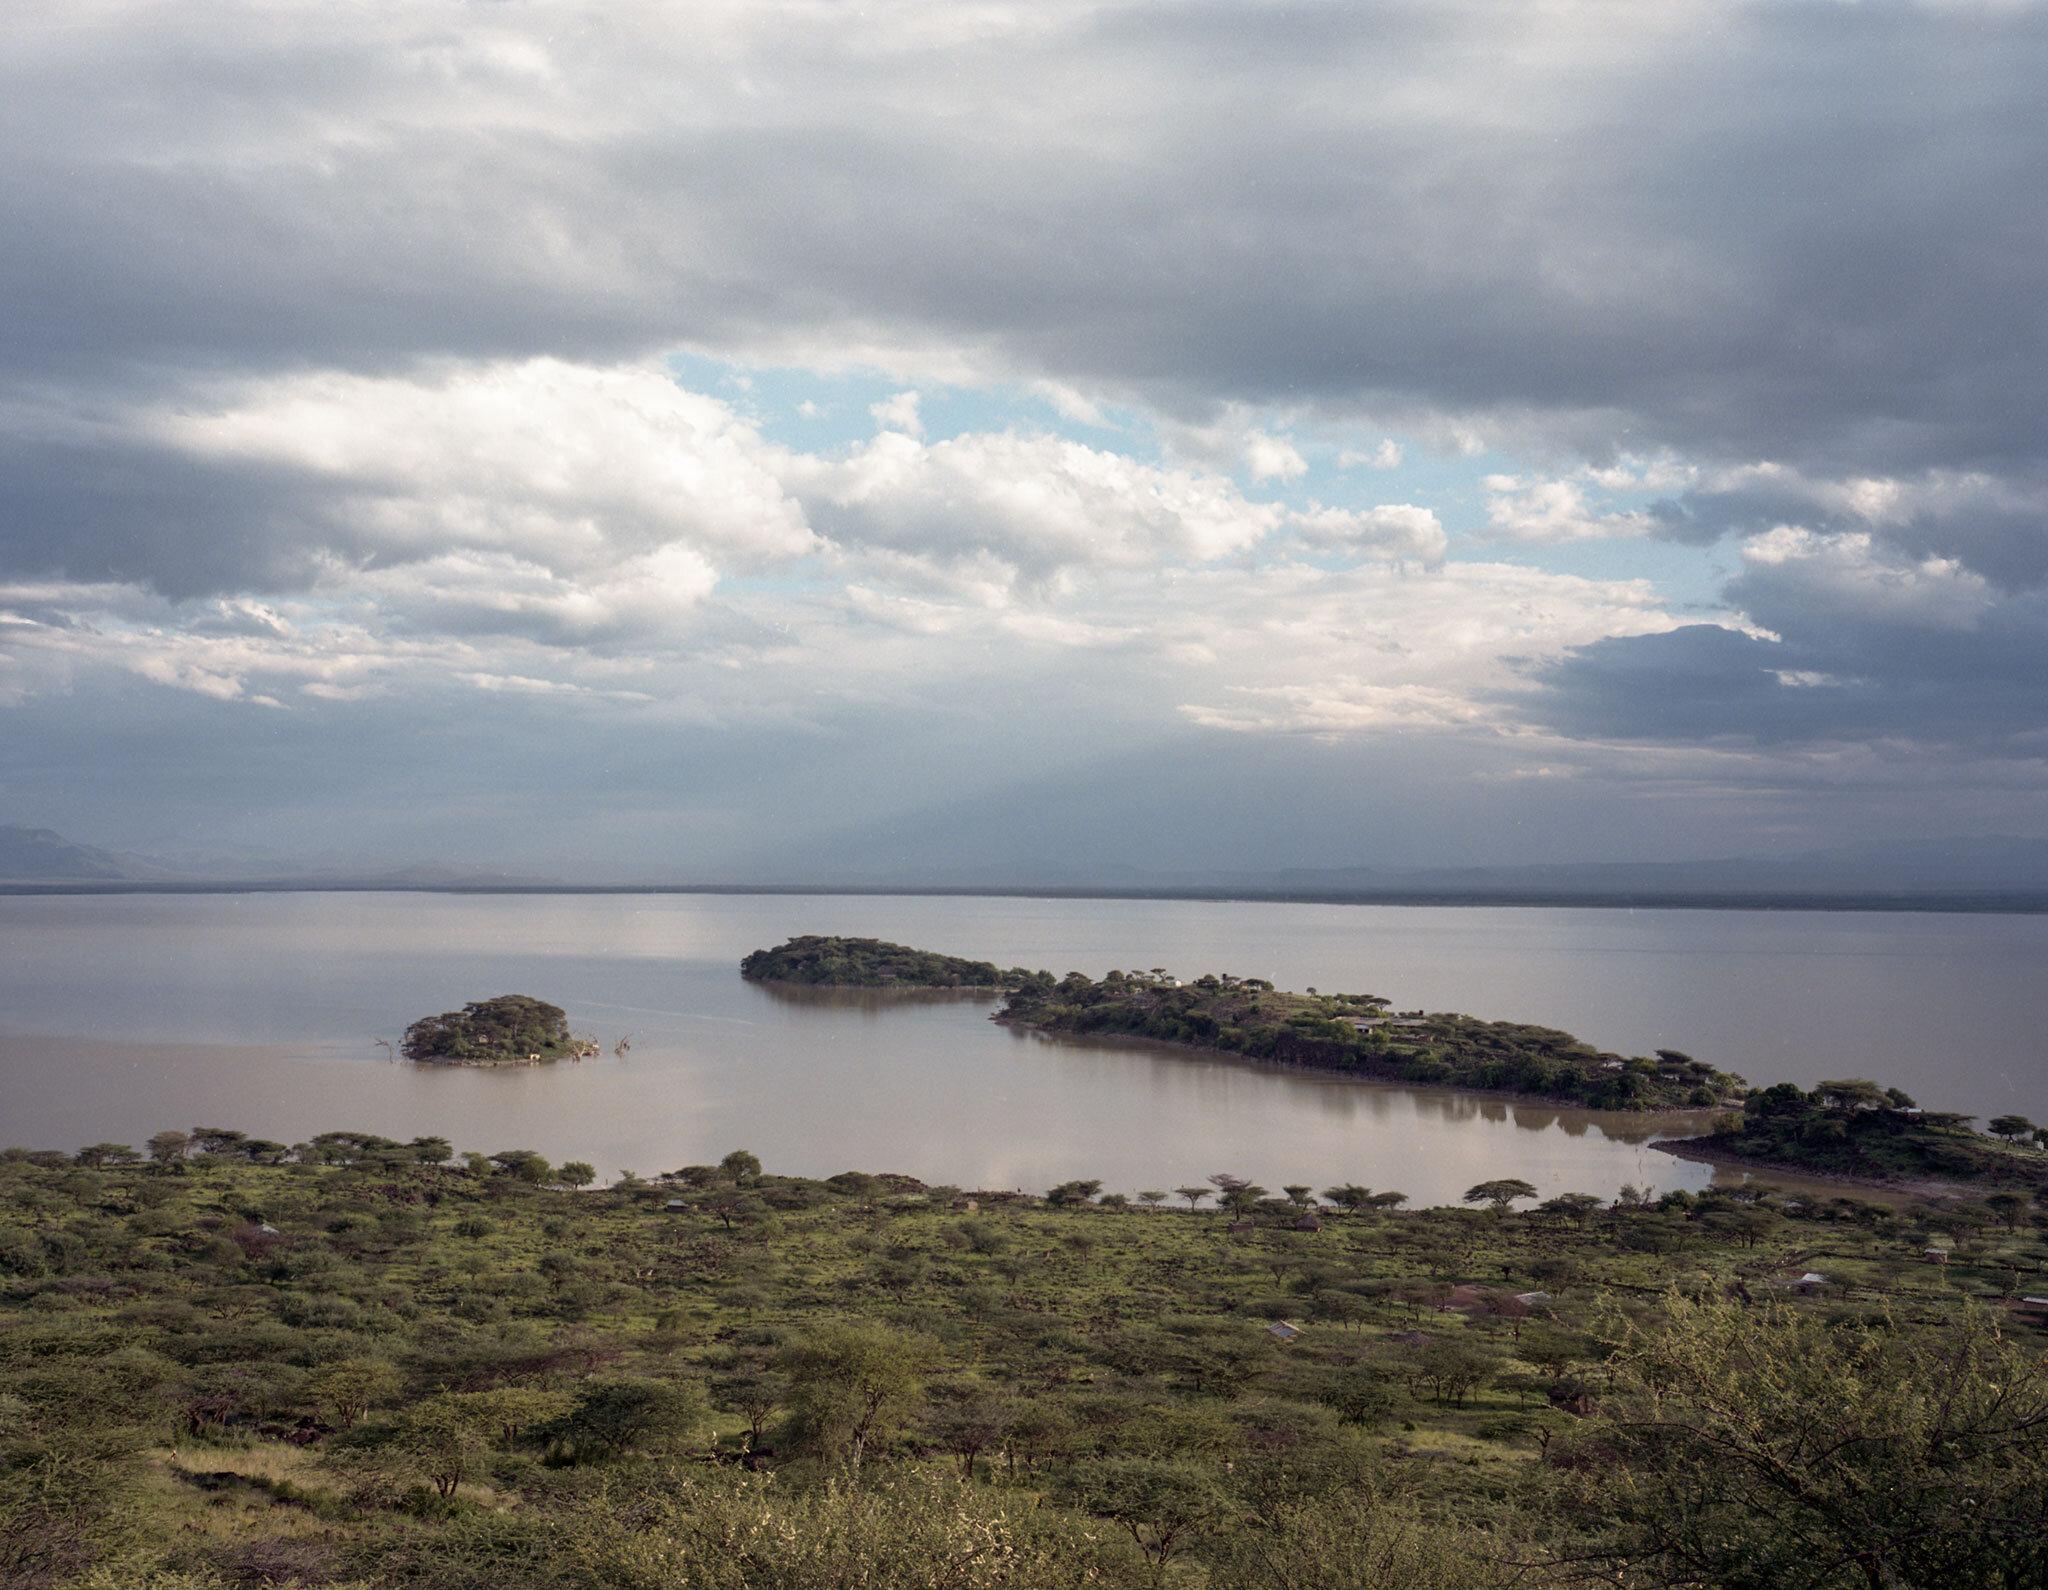 Kokwa Island